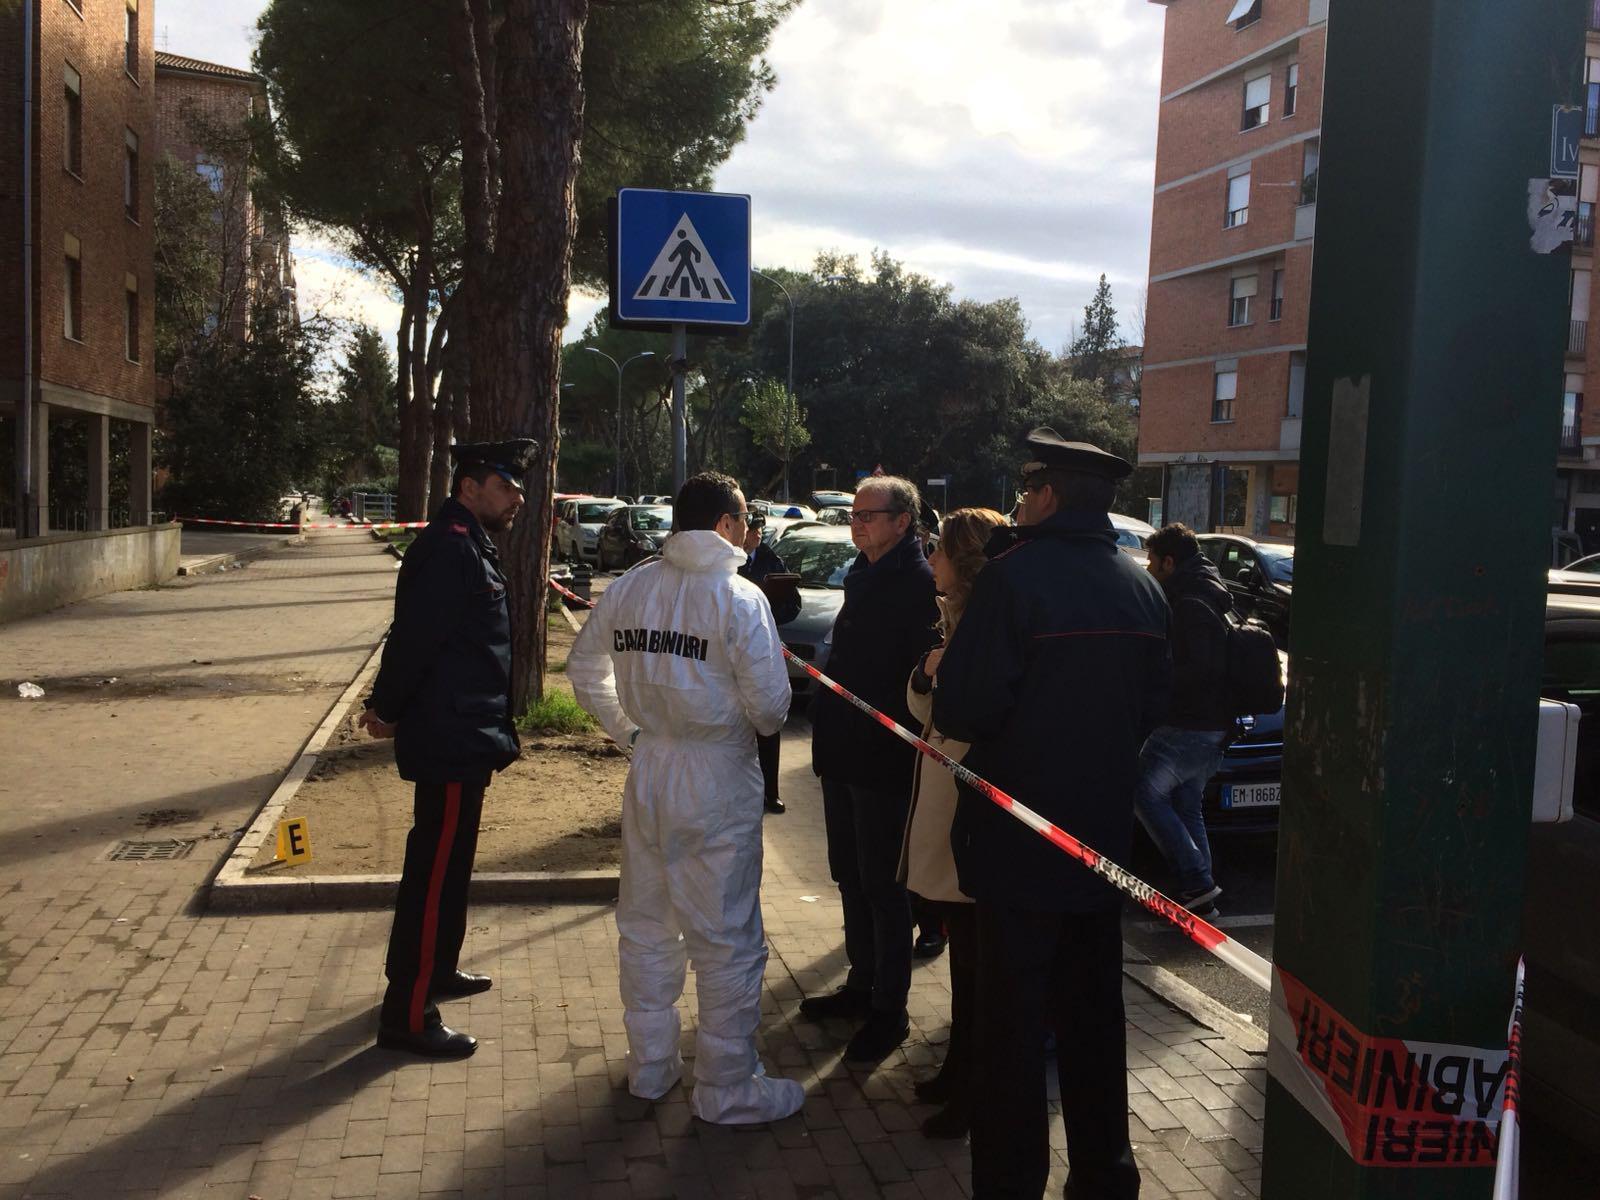 In moto spara e ferisce quattro persone a Pisa